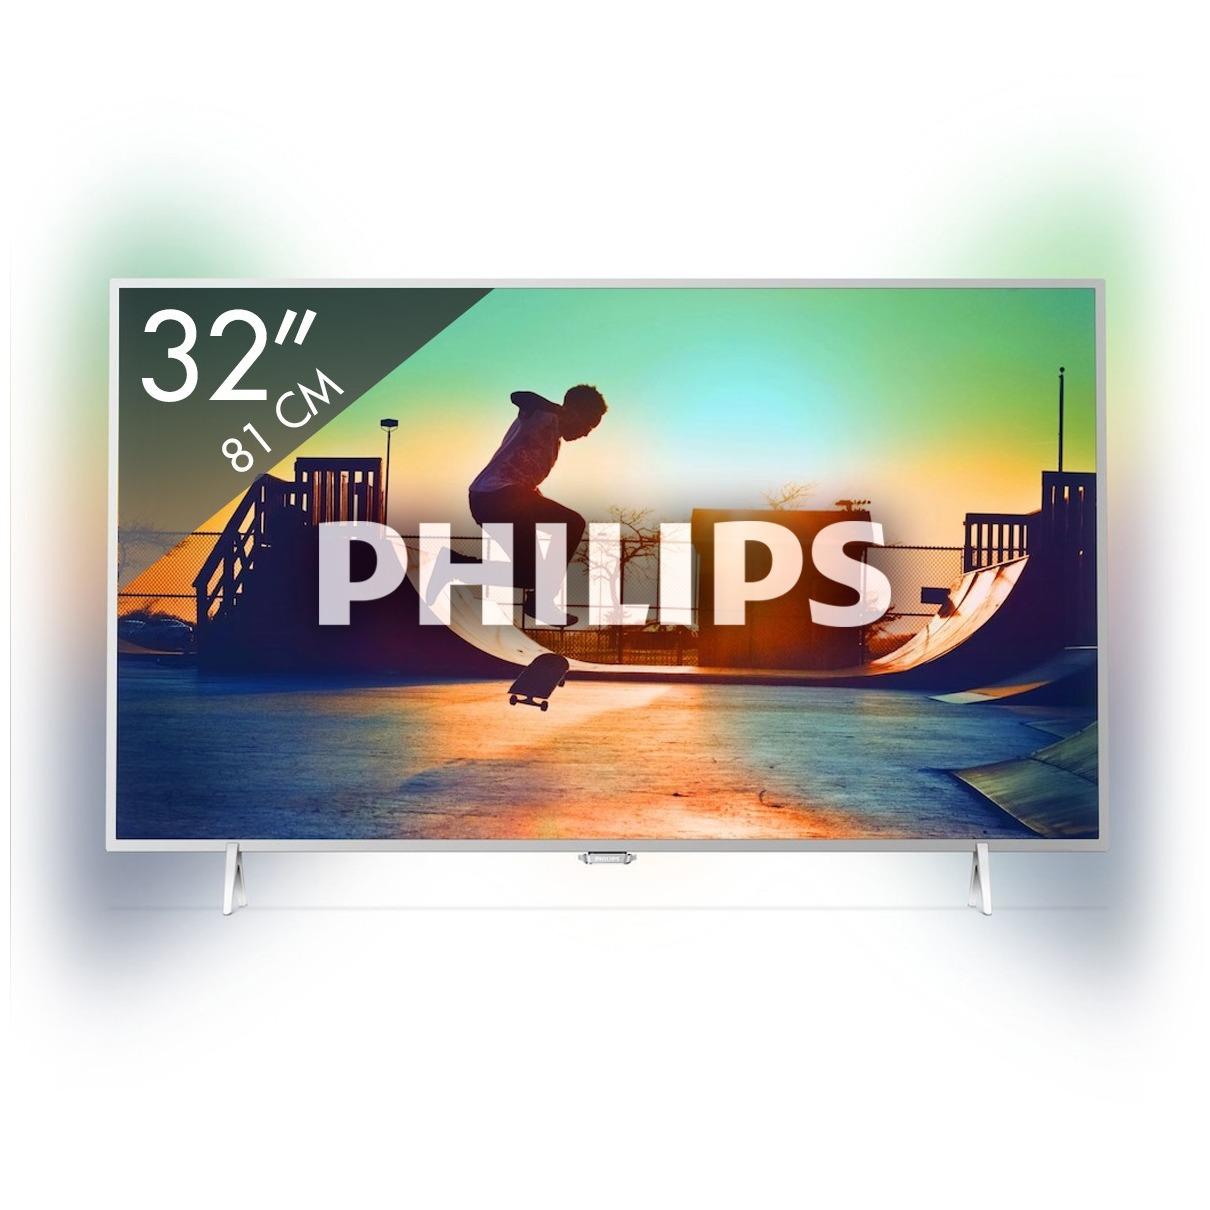 PHILIPS LED TV 32PFS6402/12